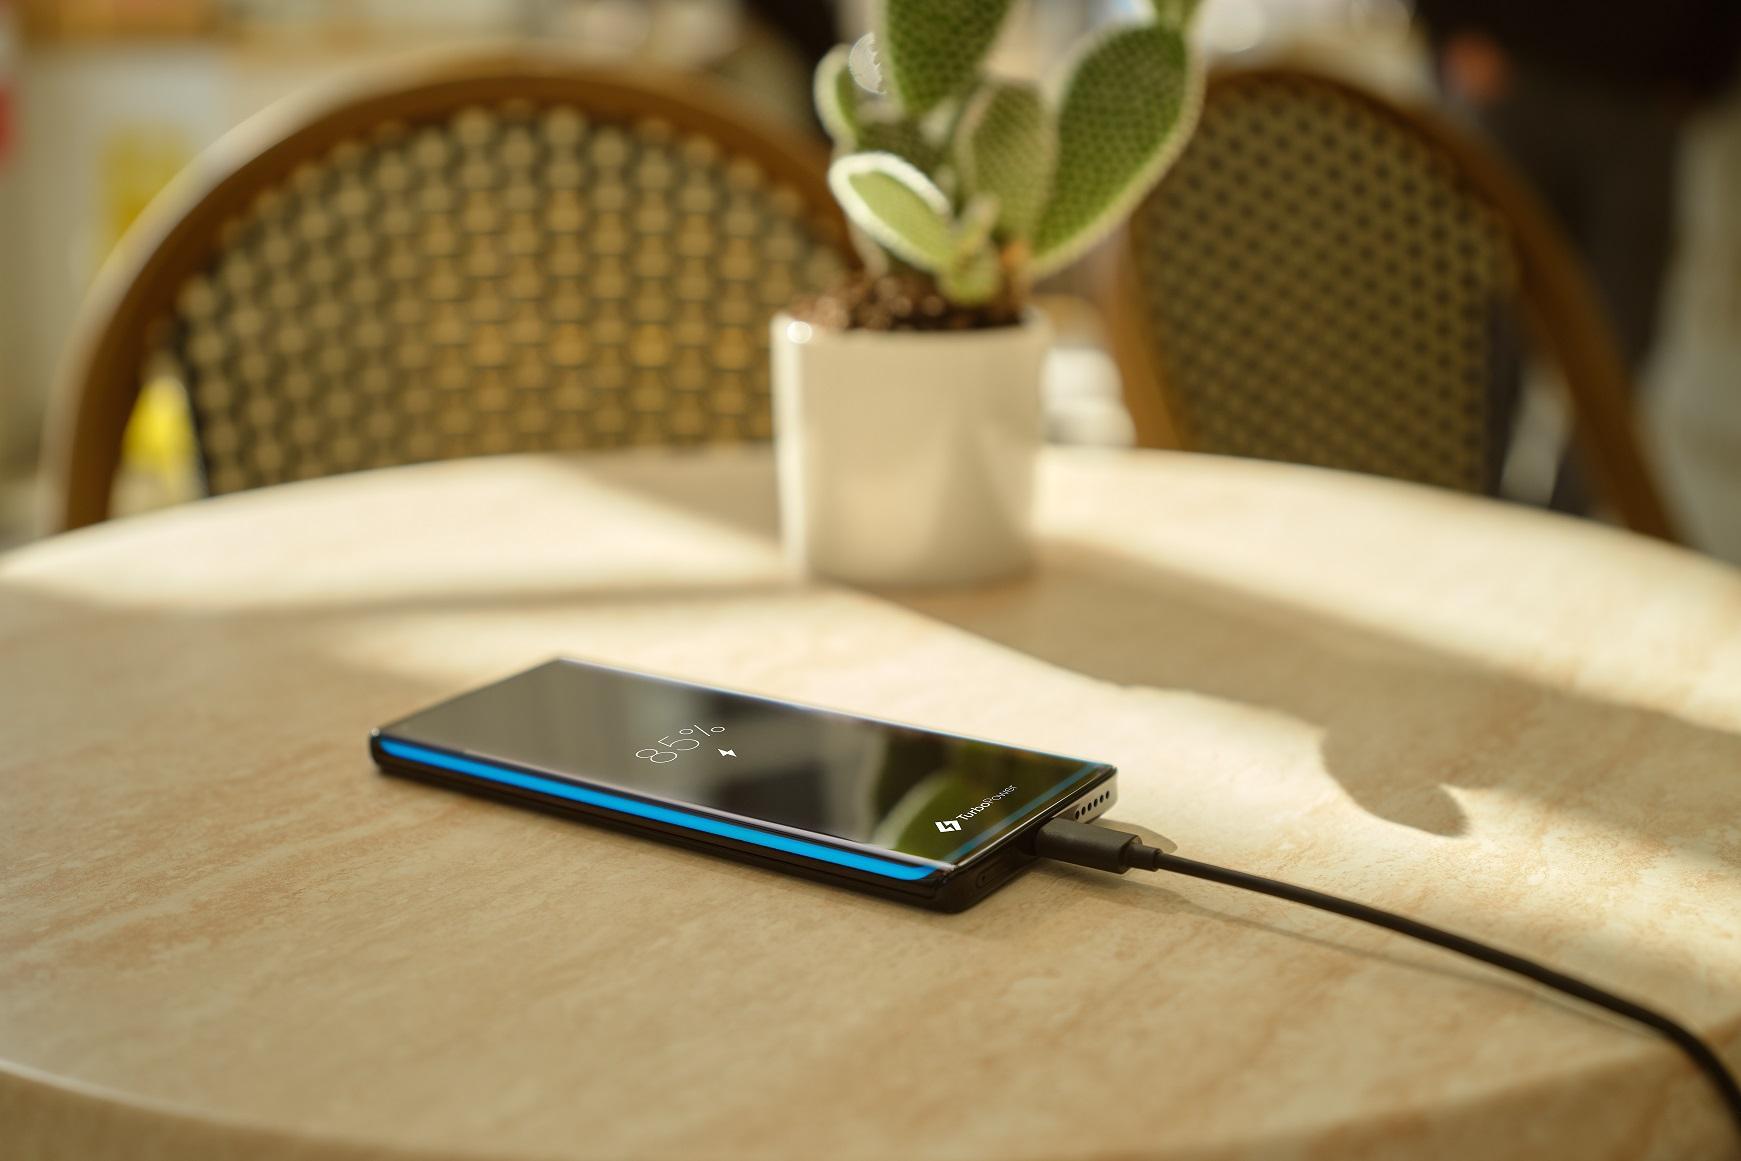 Представлен смартфон Motorola Edge+. Почему его все хотят?